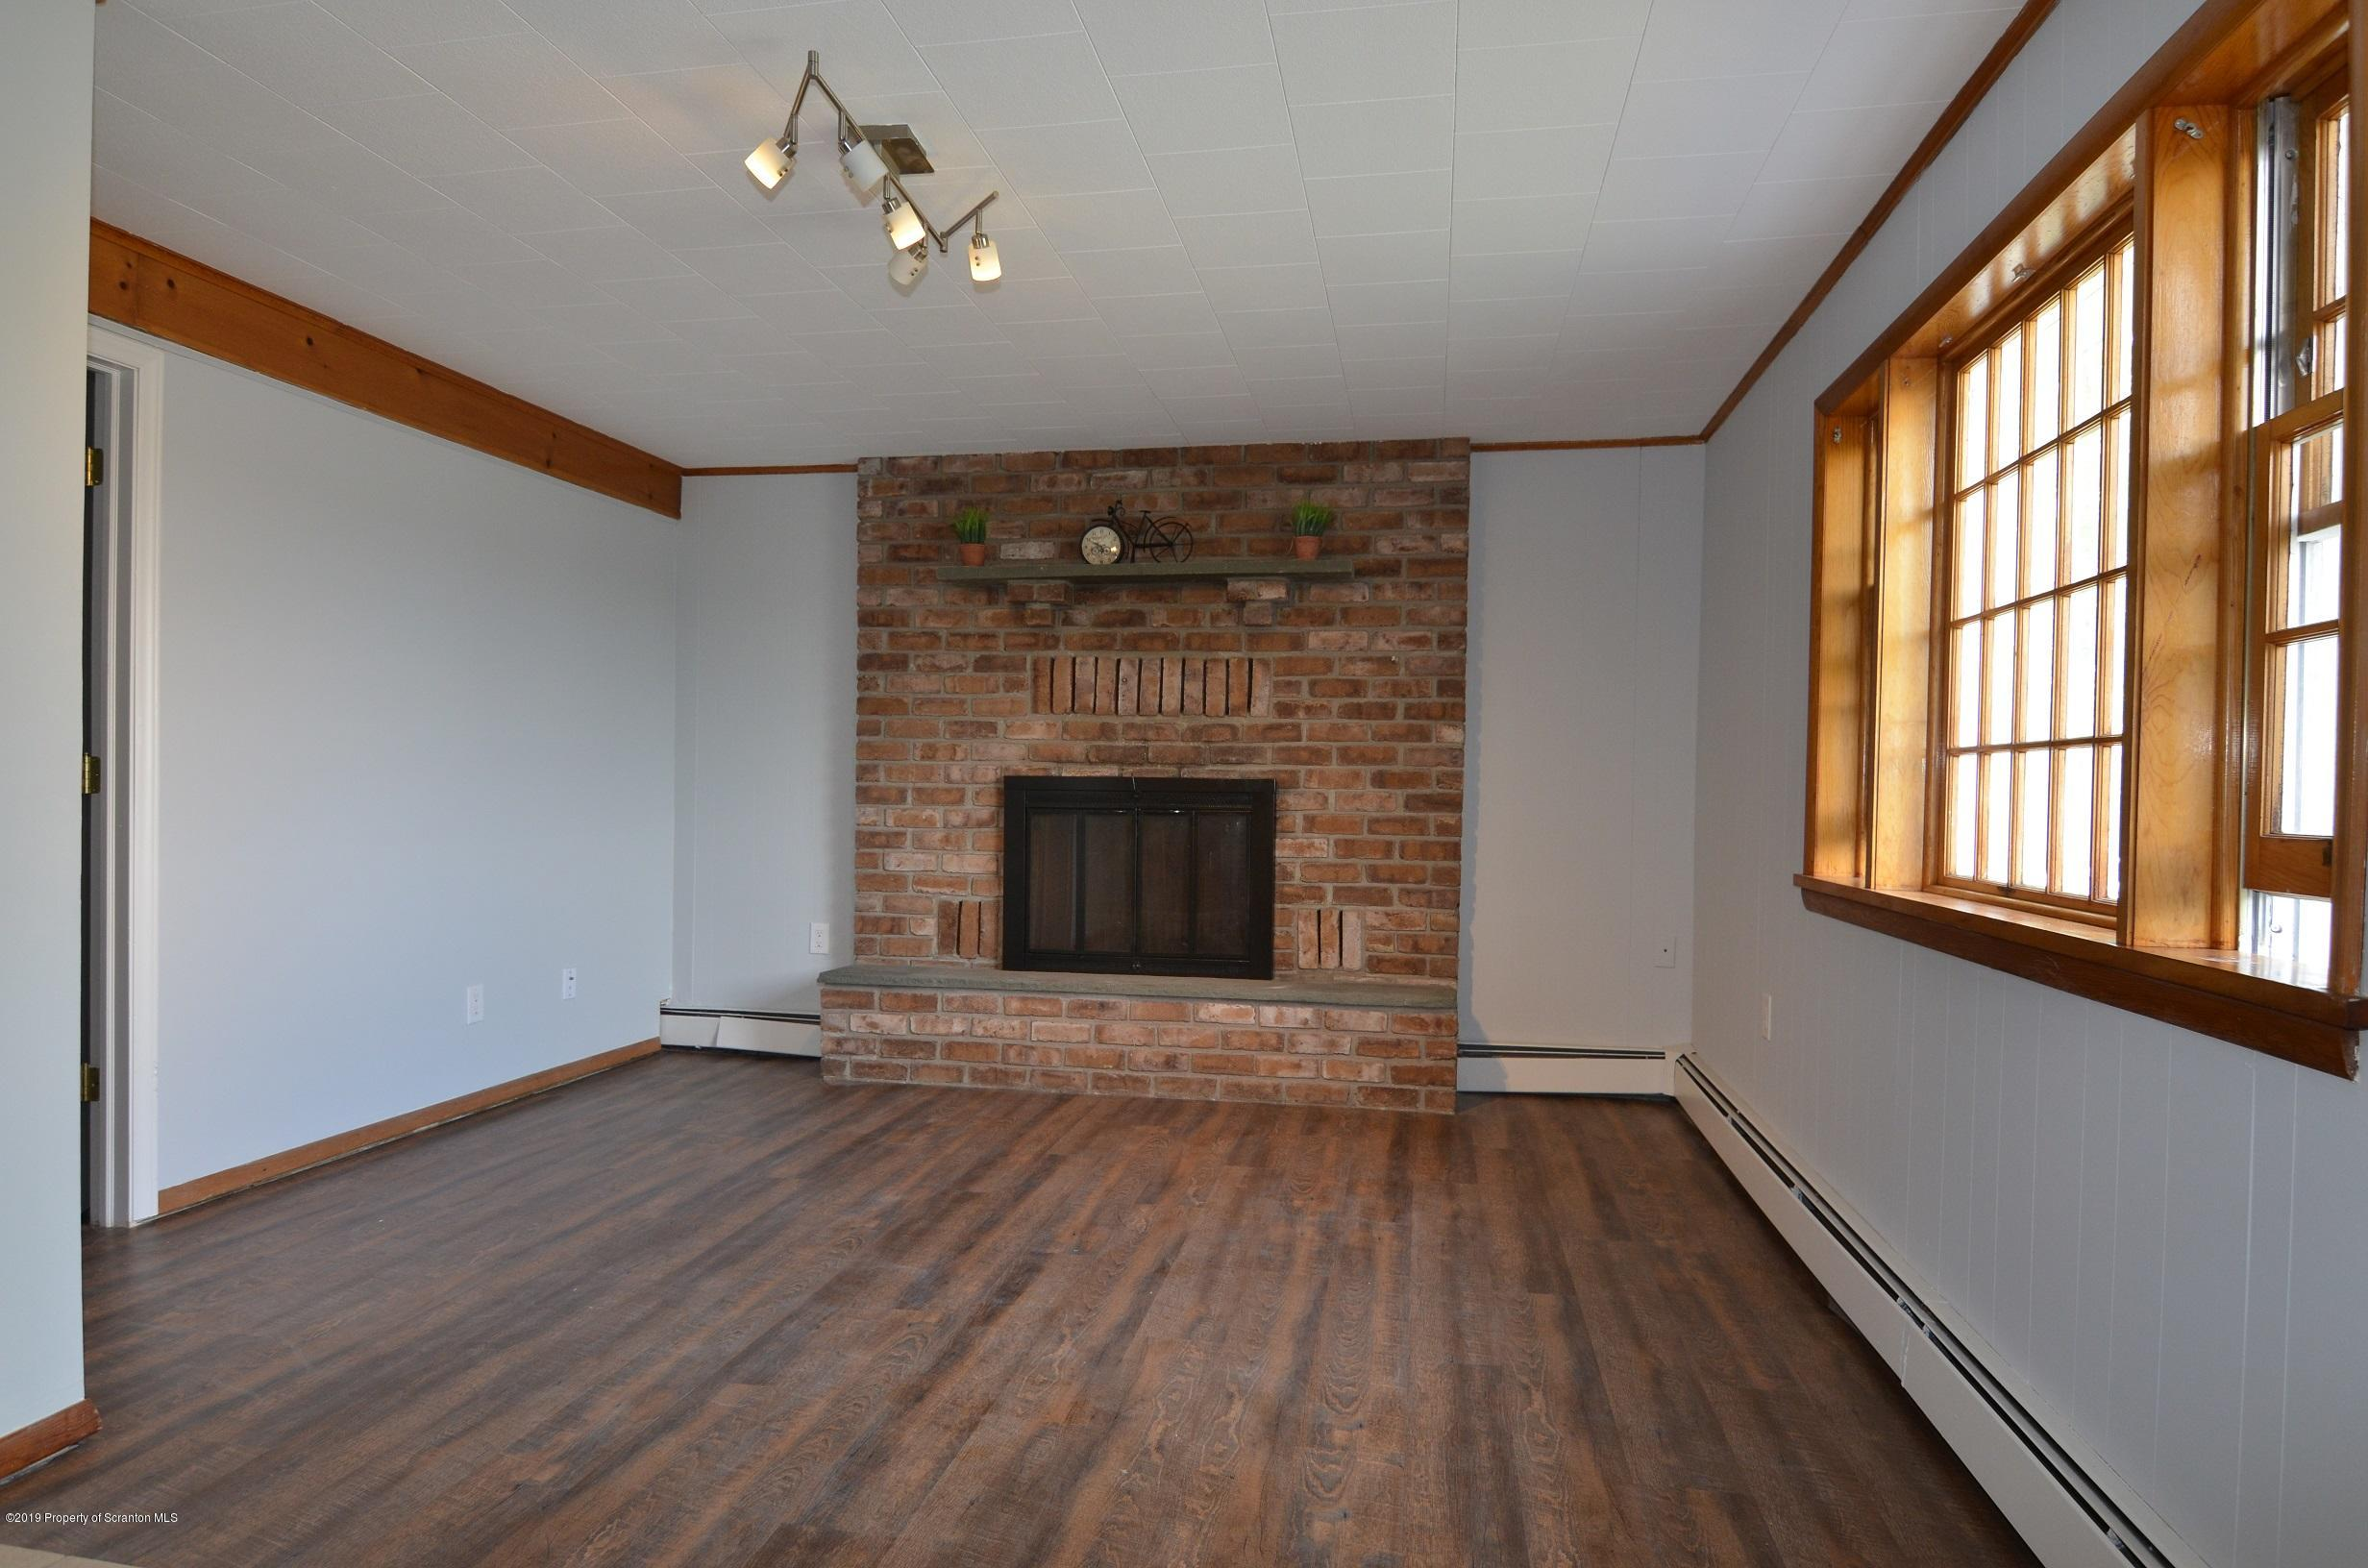 122 Carol Dr, Clarks Summit, Pennsylvania 18411, 4 Bedrooms Bedrooms, 8 Rooms Rooms,3 BathroomsBathrooms,Single Family,For Sale,Carol,19-3623